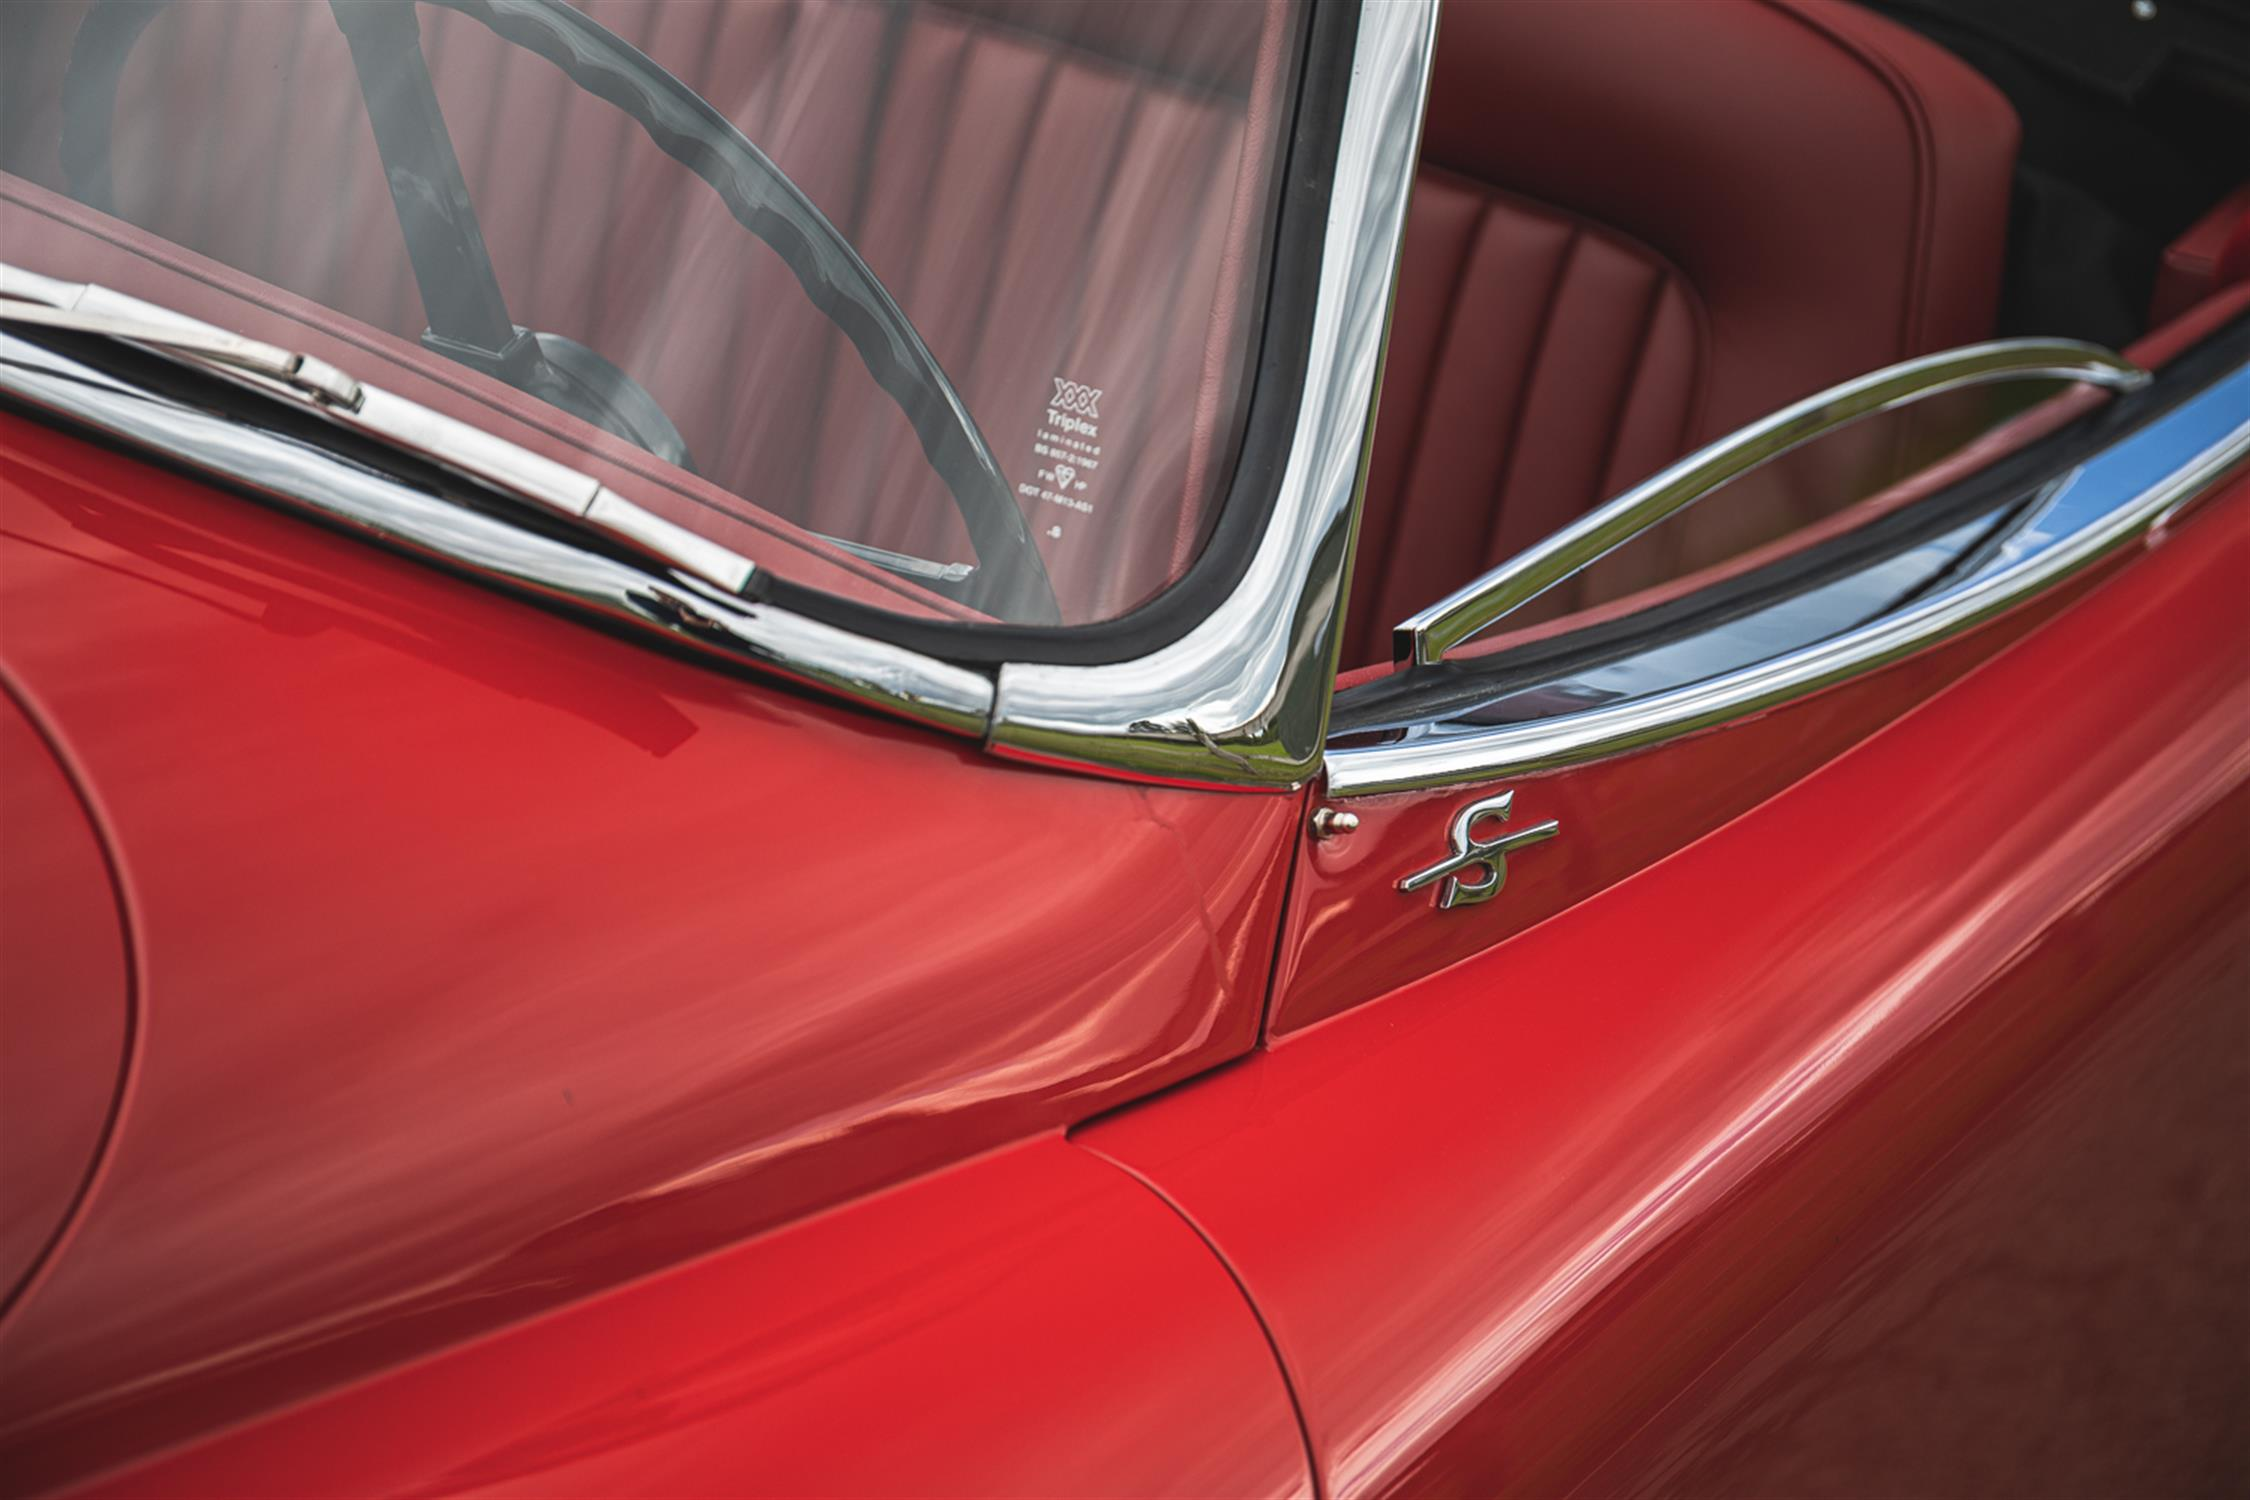 1958 Jaguar XK150 3.4-Litre 'S' Roadster (LHD) - Image 10 of 10